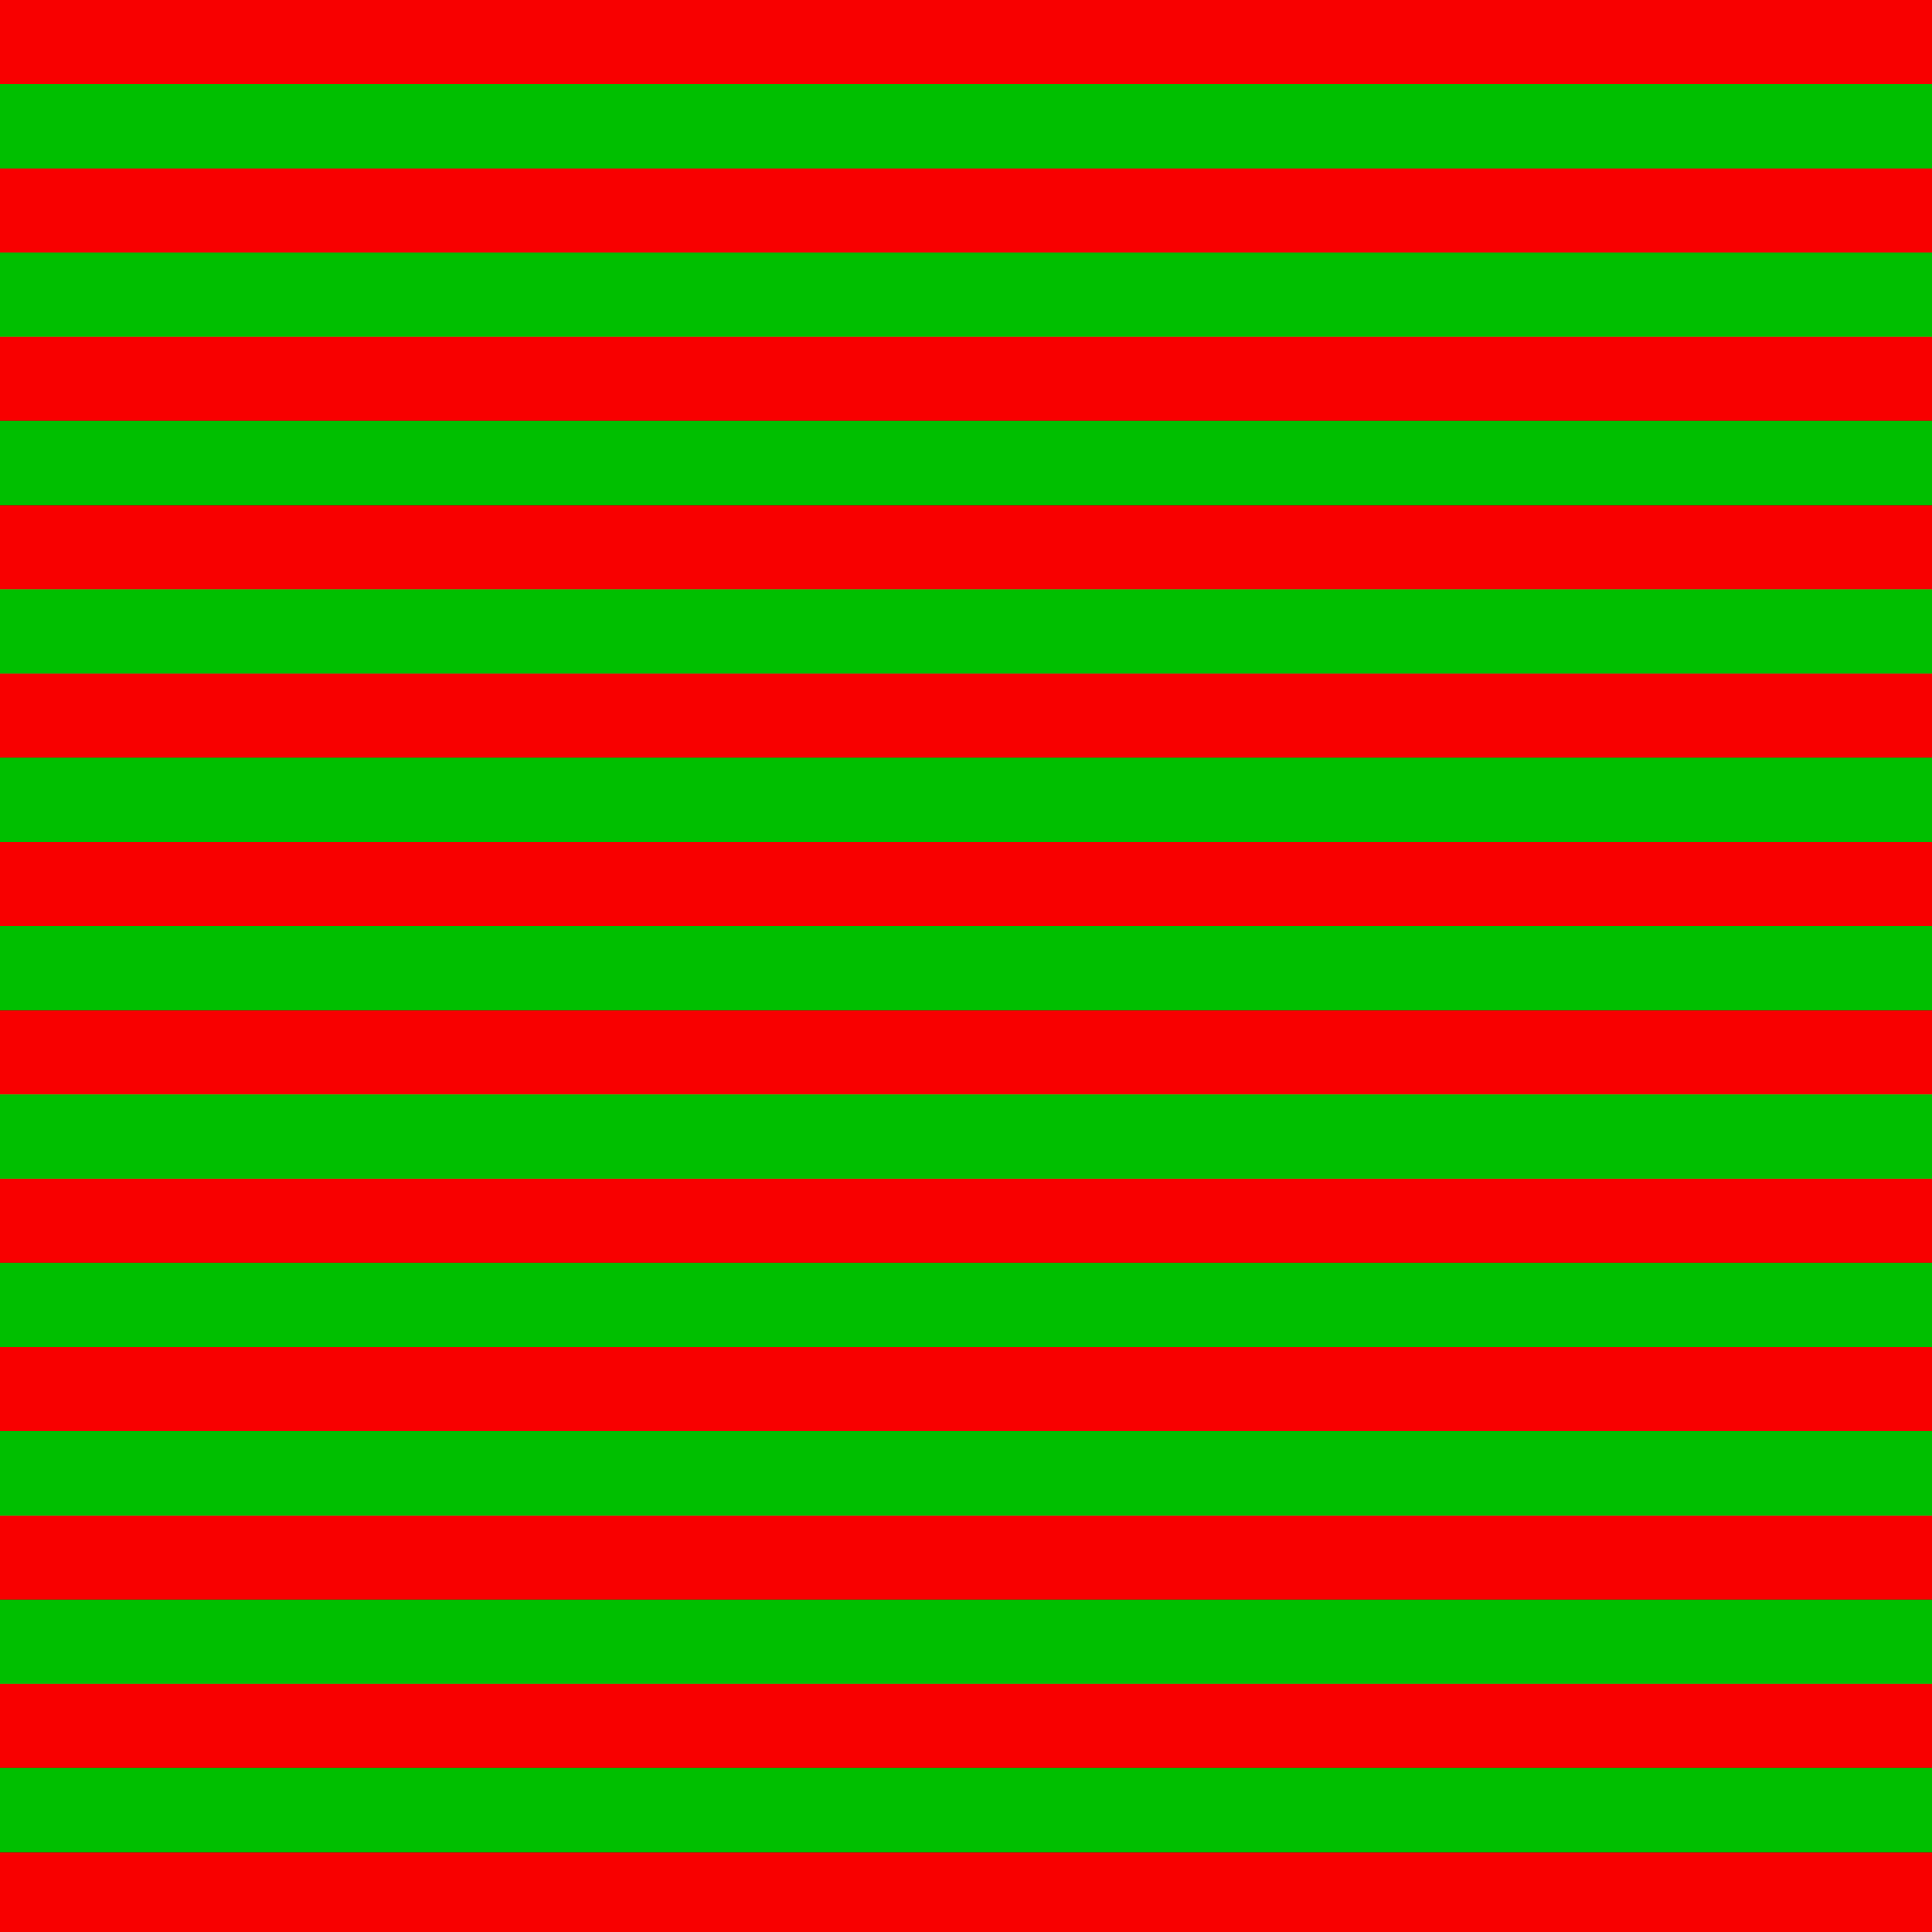 Green stripy clipart.